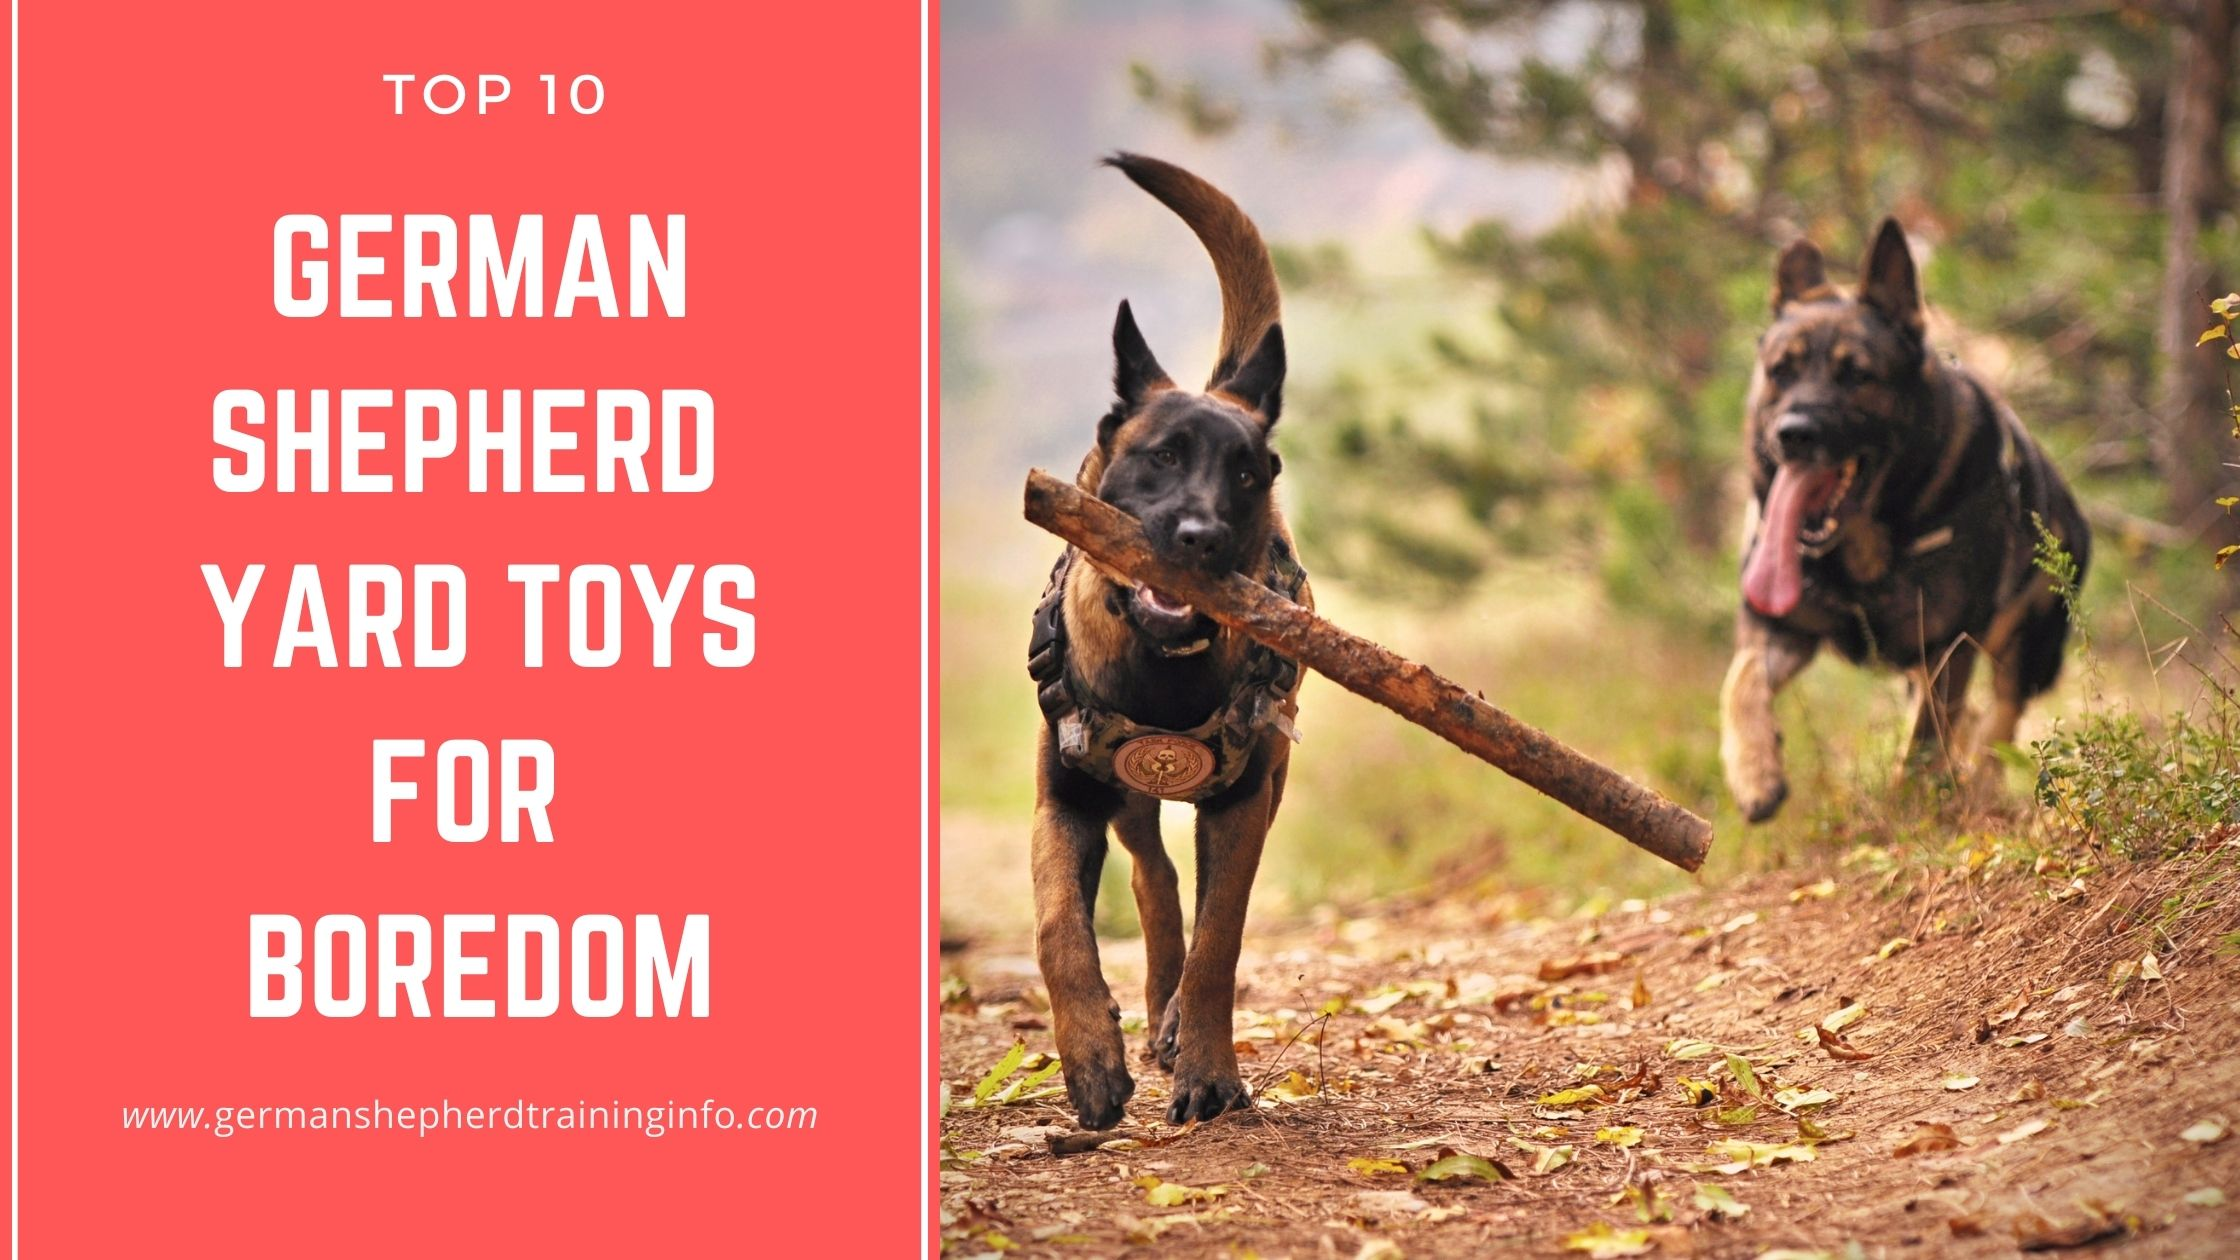 10 Cool German Shepherd Yard Toys for Boredom